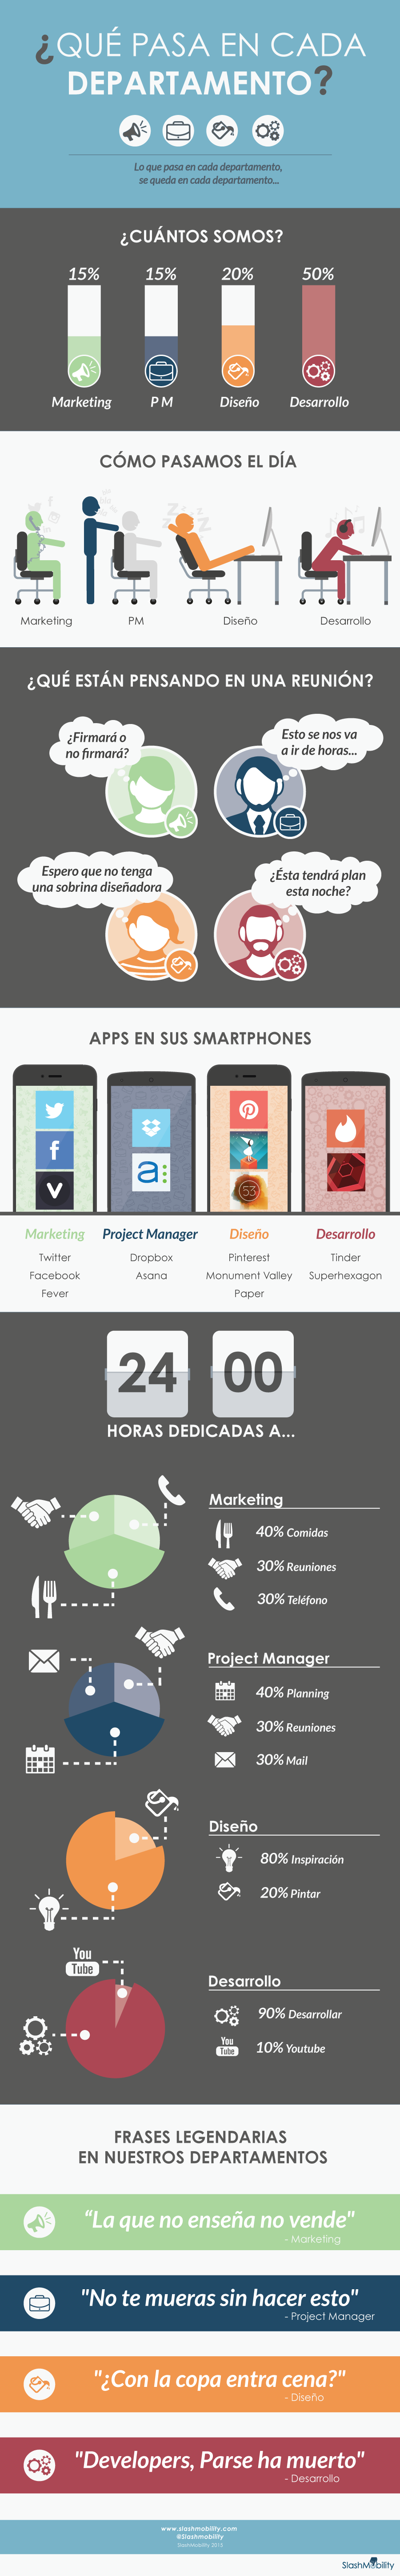 infografia_perfiles